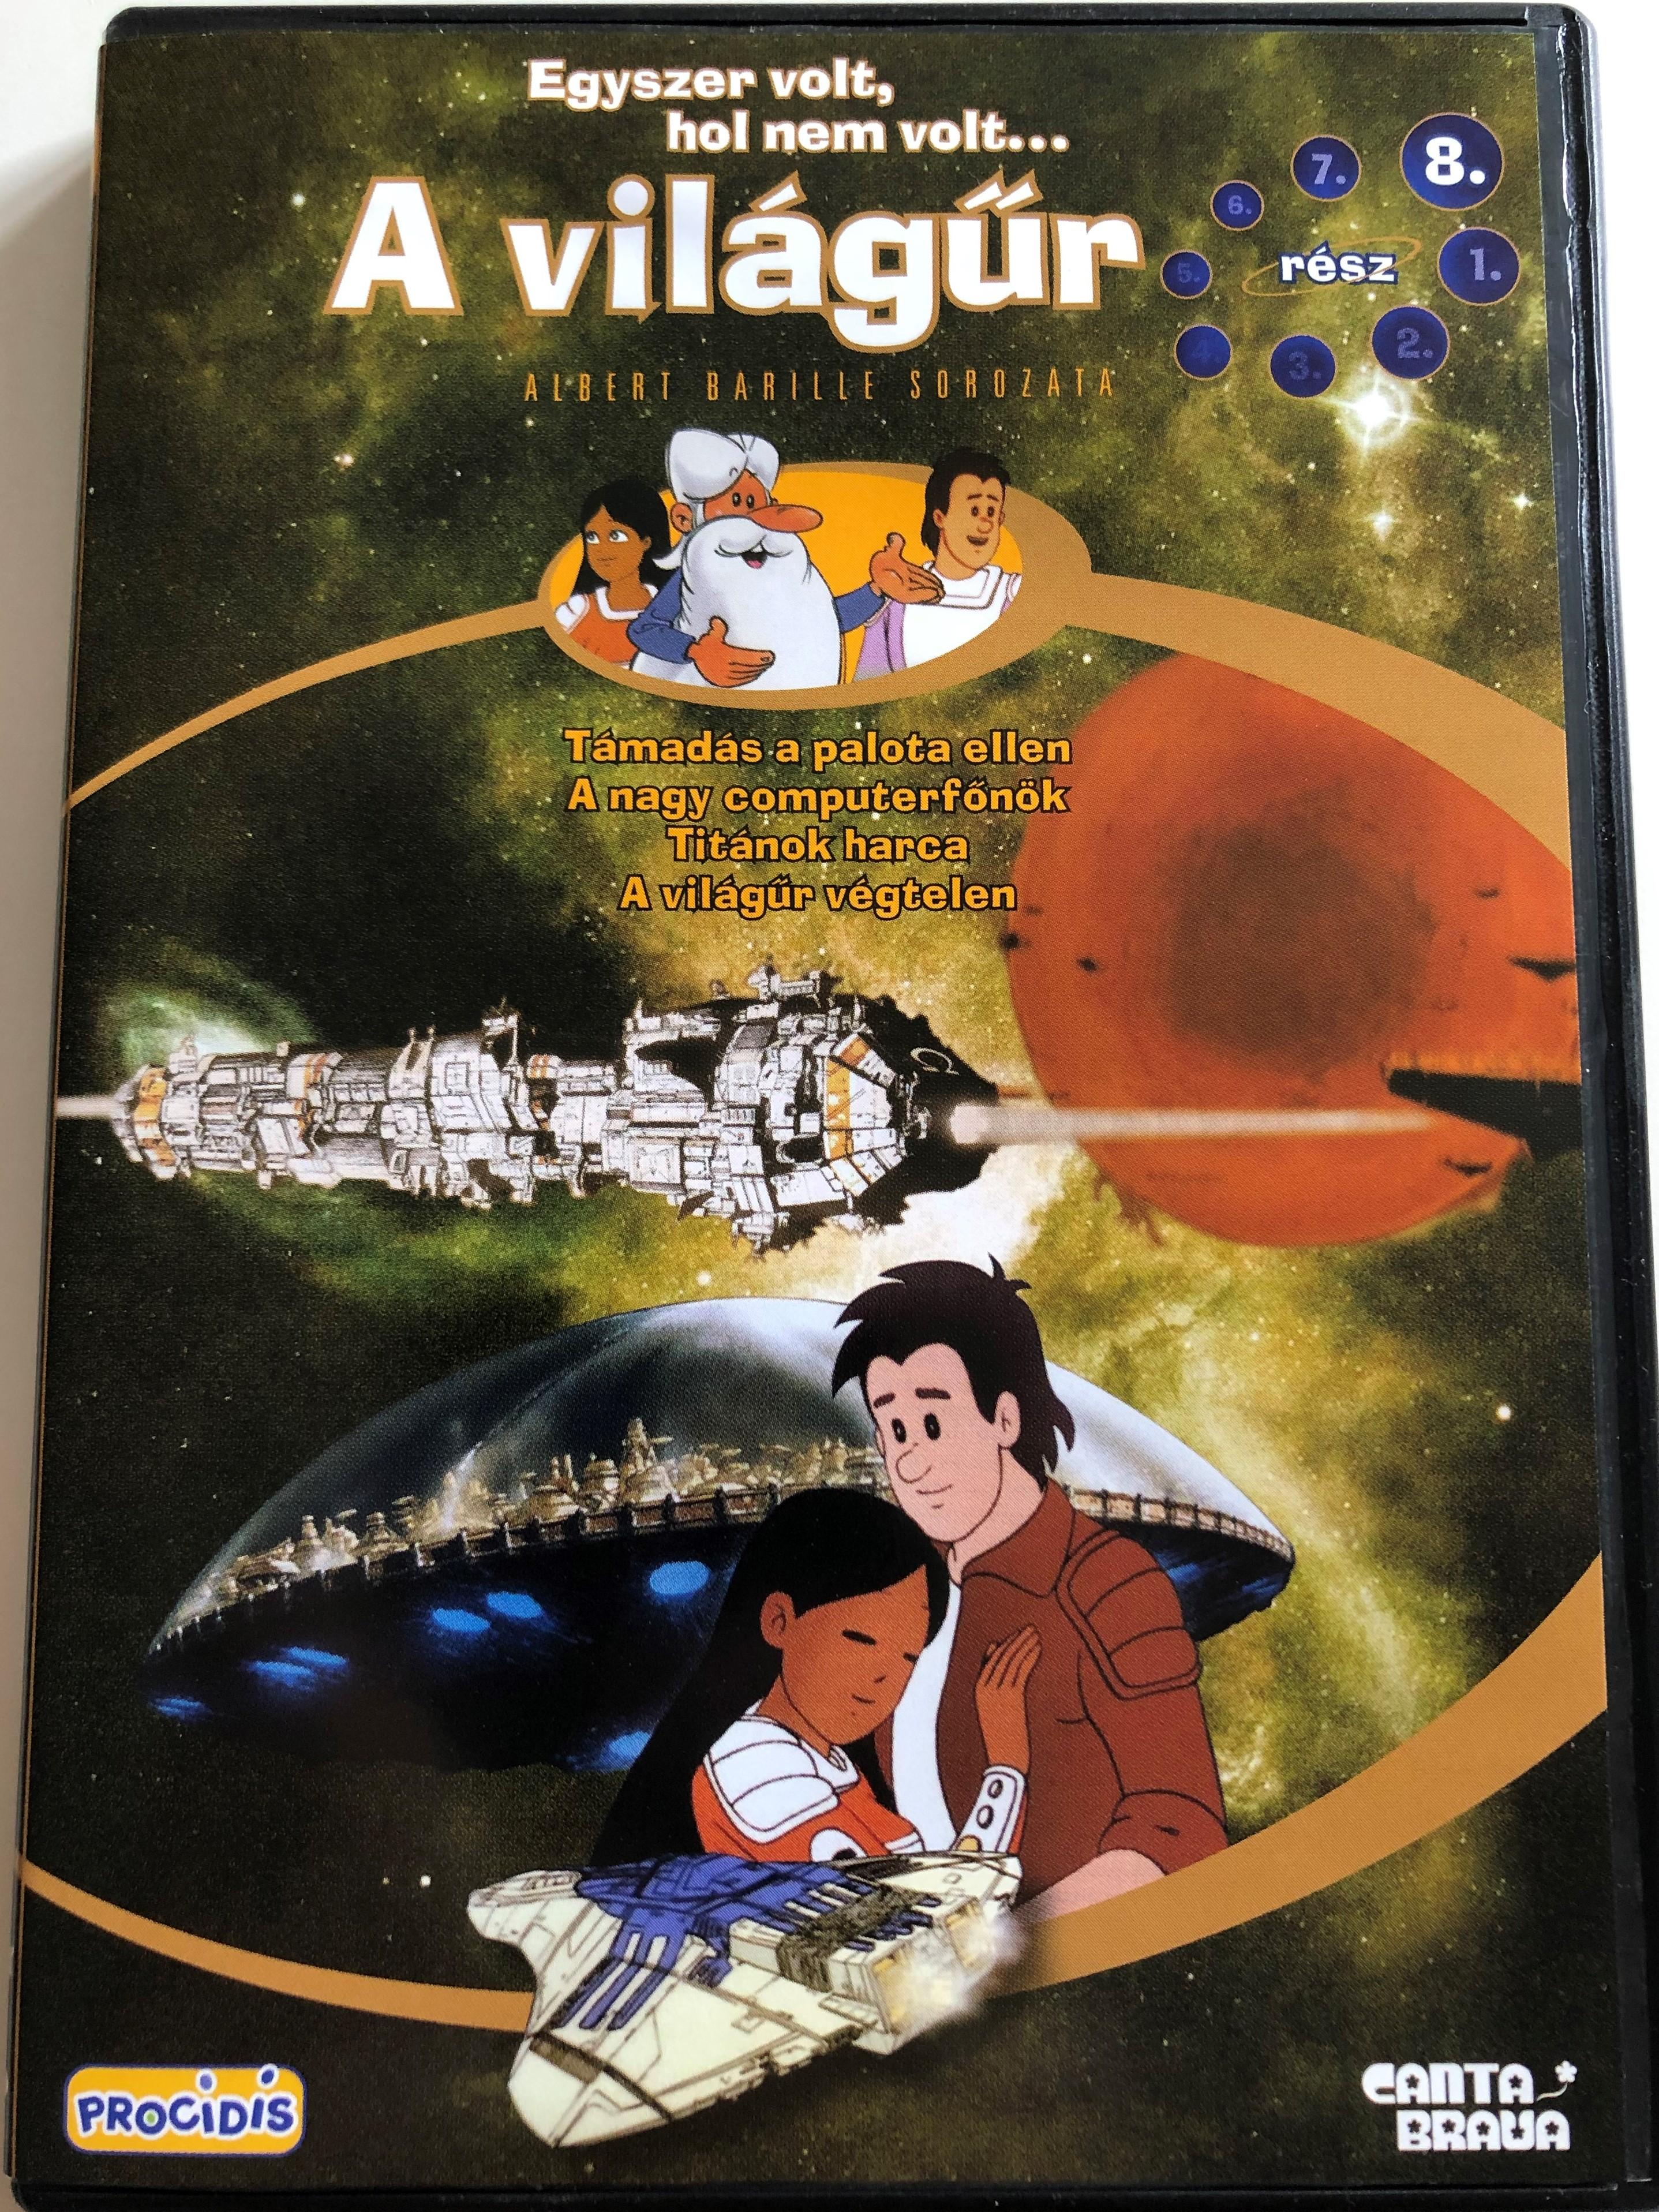 il-tait-une-fois...-l-espace-dvd-1982-egyszer-volt-hol-nem-volt...-a-vil-g-r-once-upon-a-time...-space-directed-by-albert-barill-8.-r-sz-part-8.-episodes-23-26-animated-documentary-series-1-.jpg